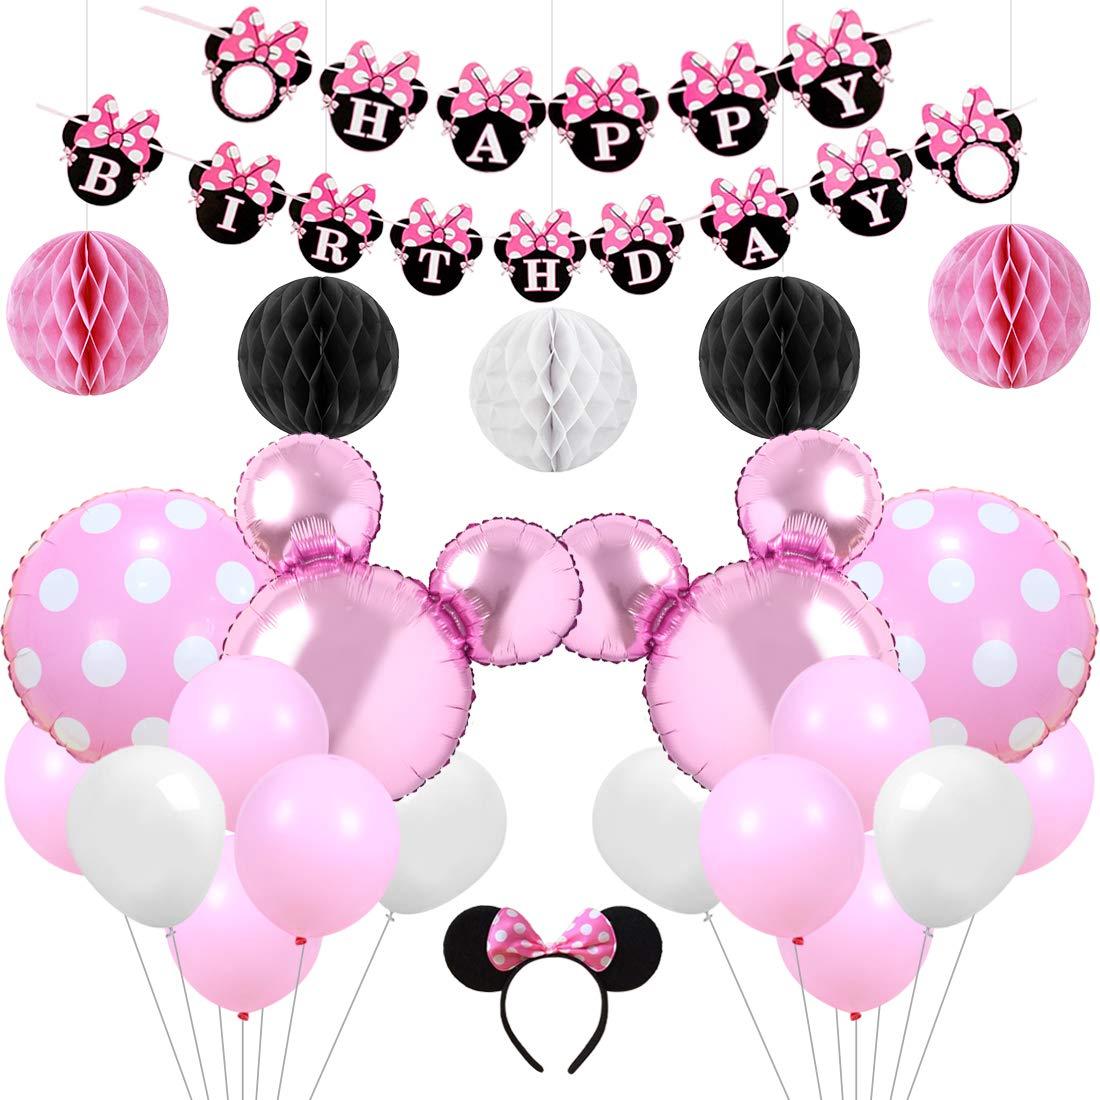 Kreatwow Pink Minnie Mouse Party Supplies Decoraciones Minnie Happy Birthday Banner Diadema para ni/ñas Cumplea/ños Baby Shower